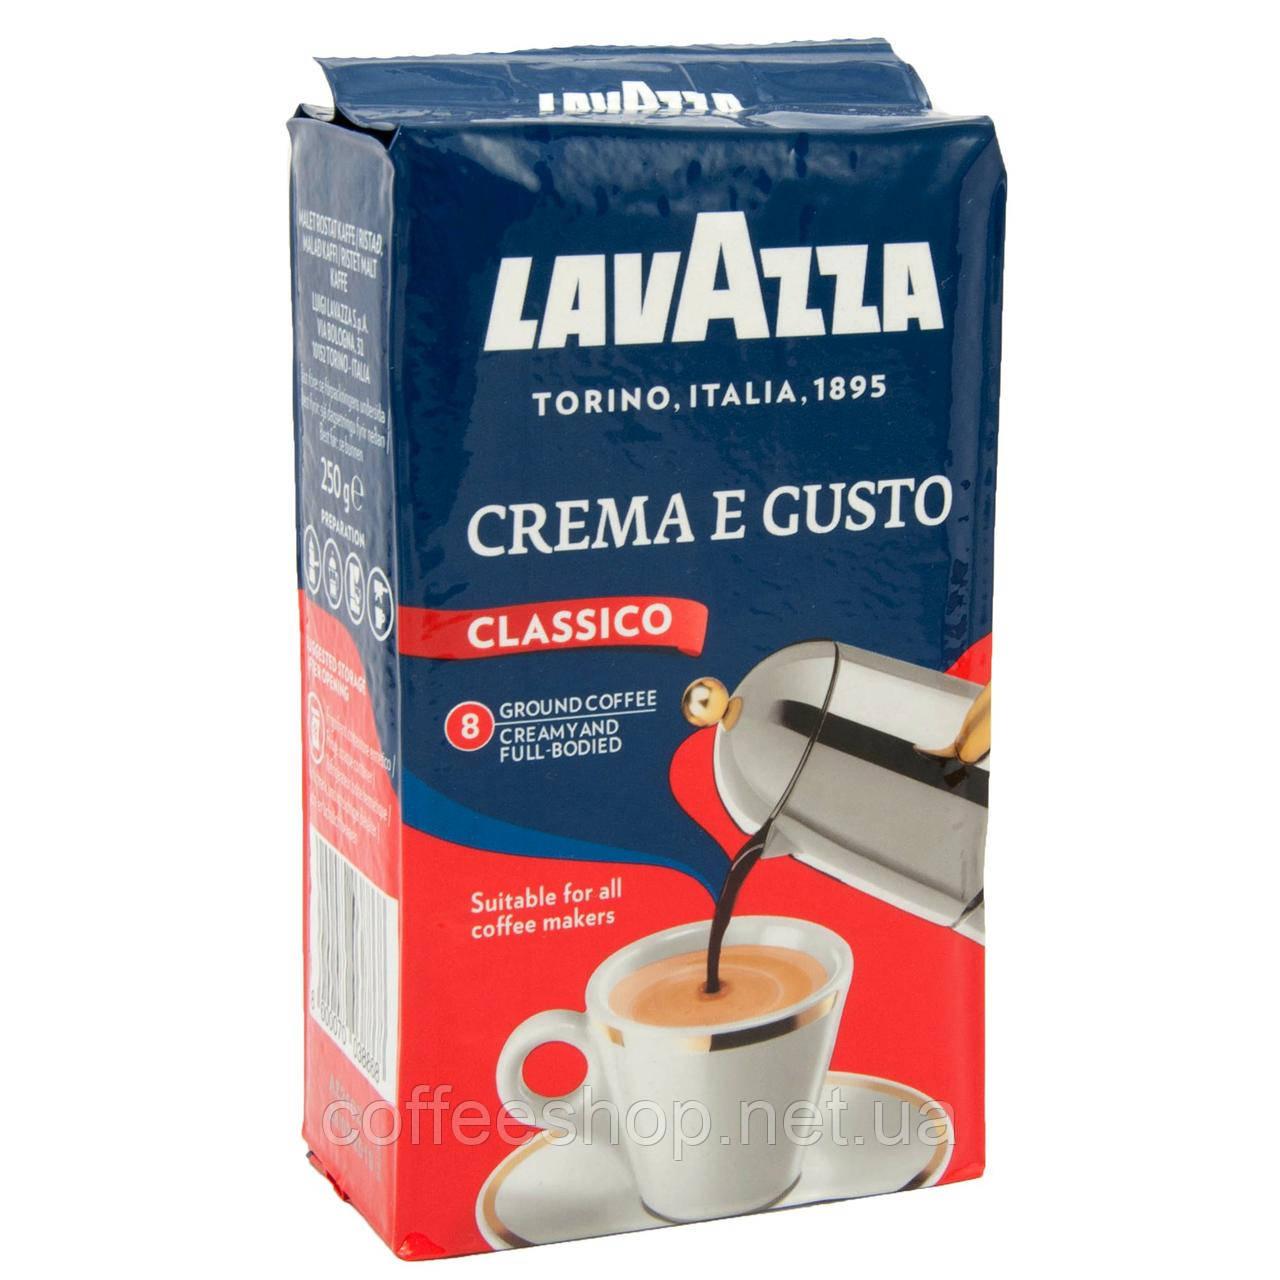 Кофе молотый Lavazza Crema e Gusto 250 г (Италия)